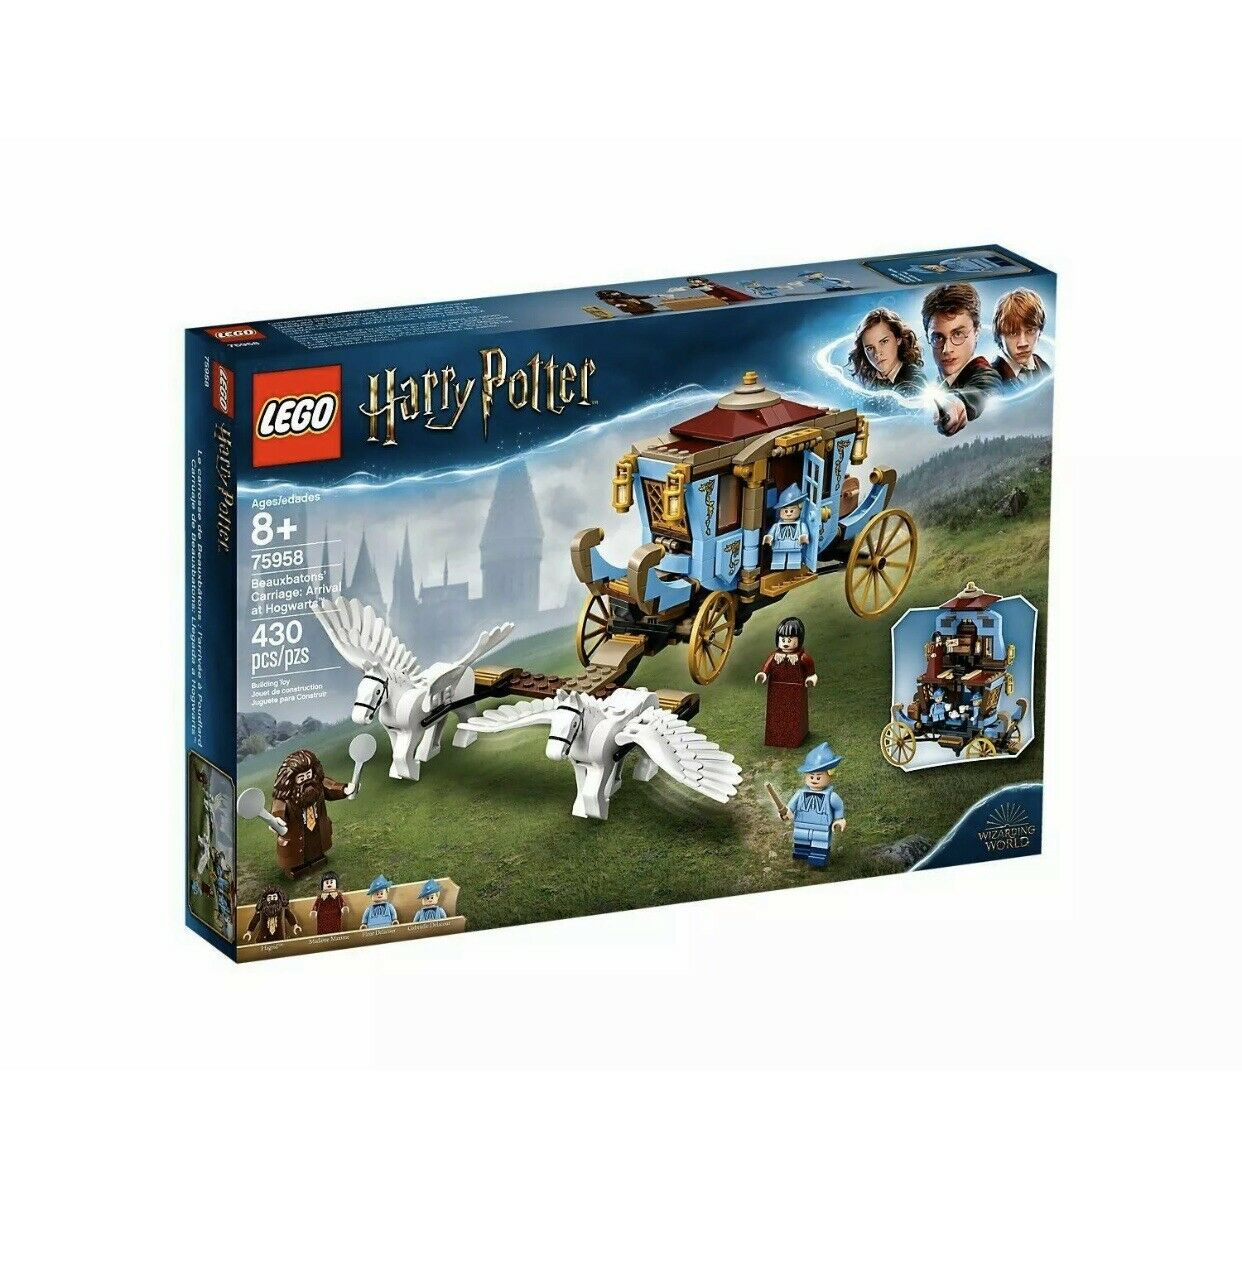 LEGO Harry Potter Beauxbatons autoriage Arrival at Hogwarts 75958 gratuito SHIPPING